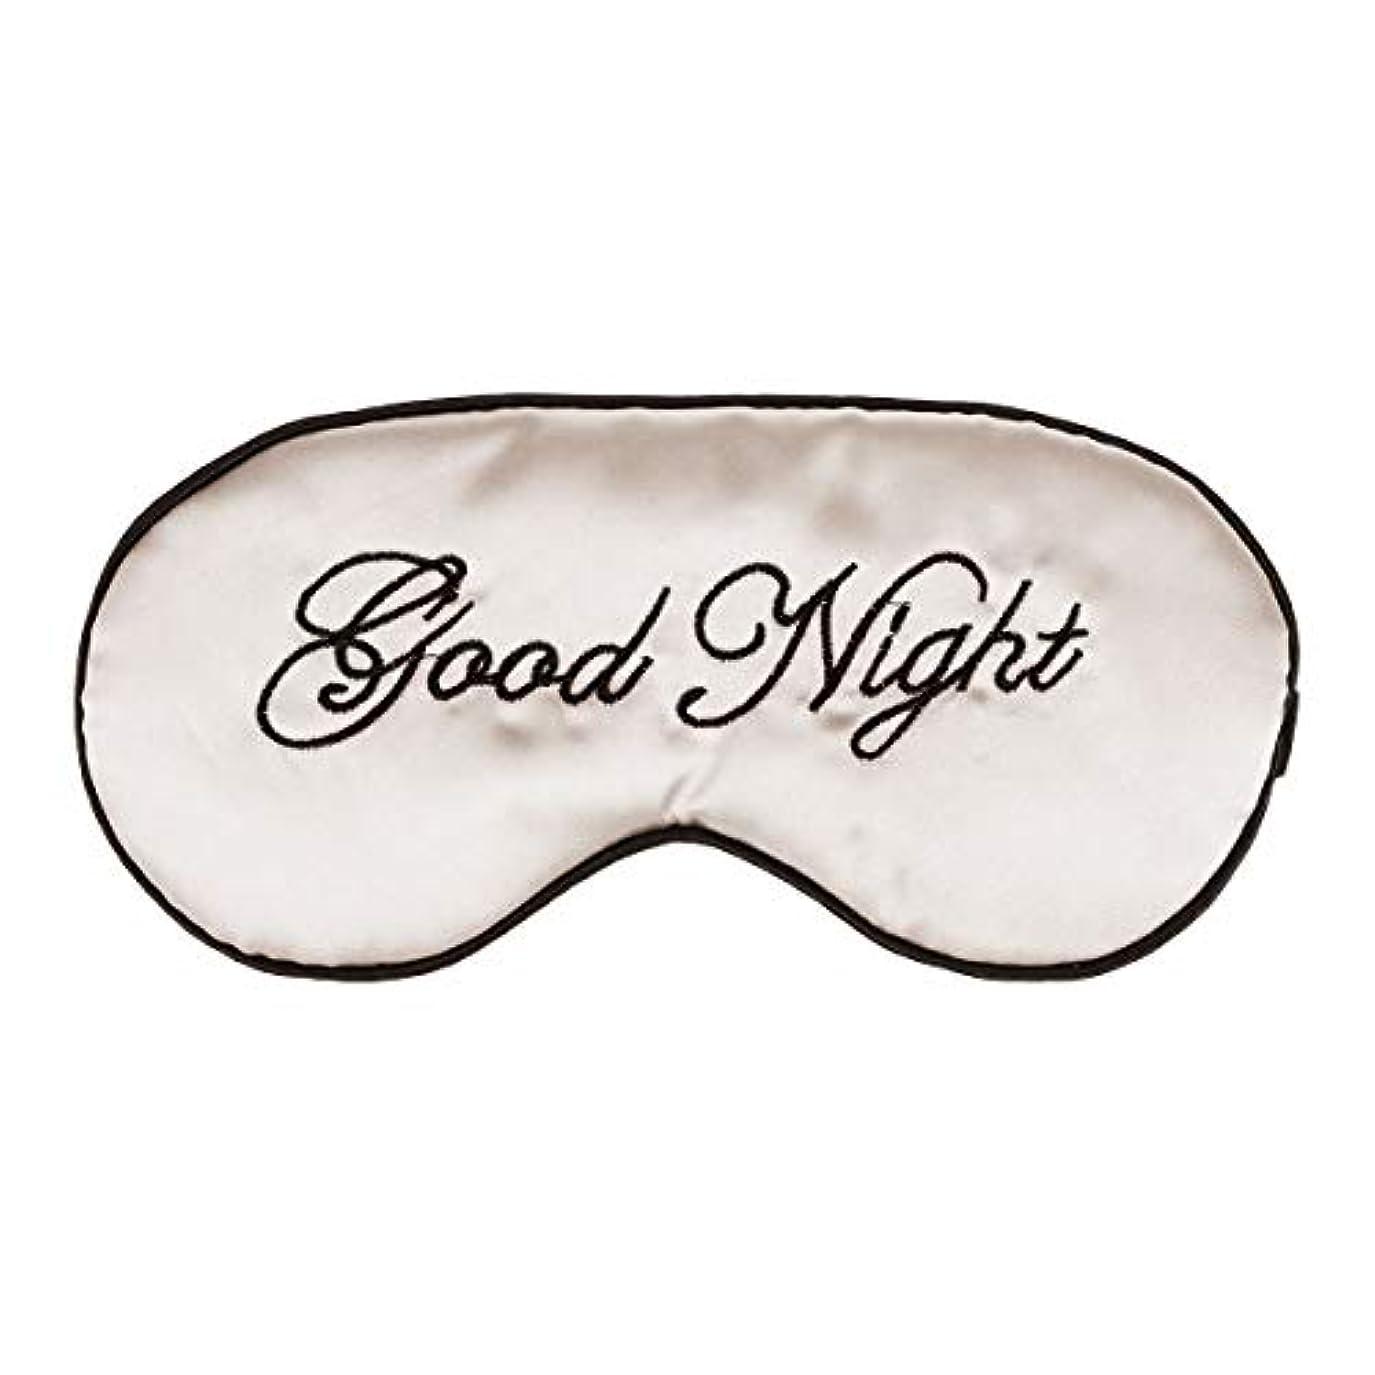 SUPVOX シルクスリーピングマスク 刺繍スタイル 睡眠 アイマスク 軽量 アイマスク 遮光 圧迫感なし 疲れ目 睡眠 旅行 仮 眠 疲労回復に最適 無地(ベージュ)